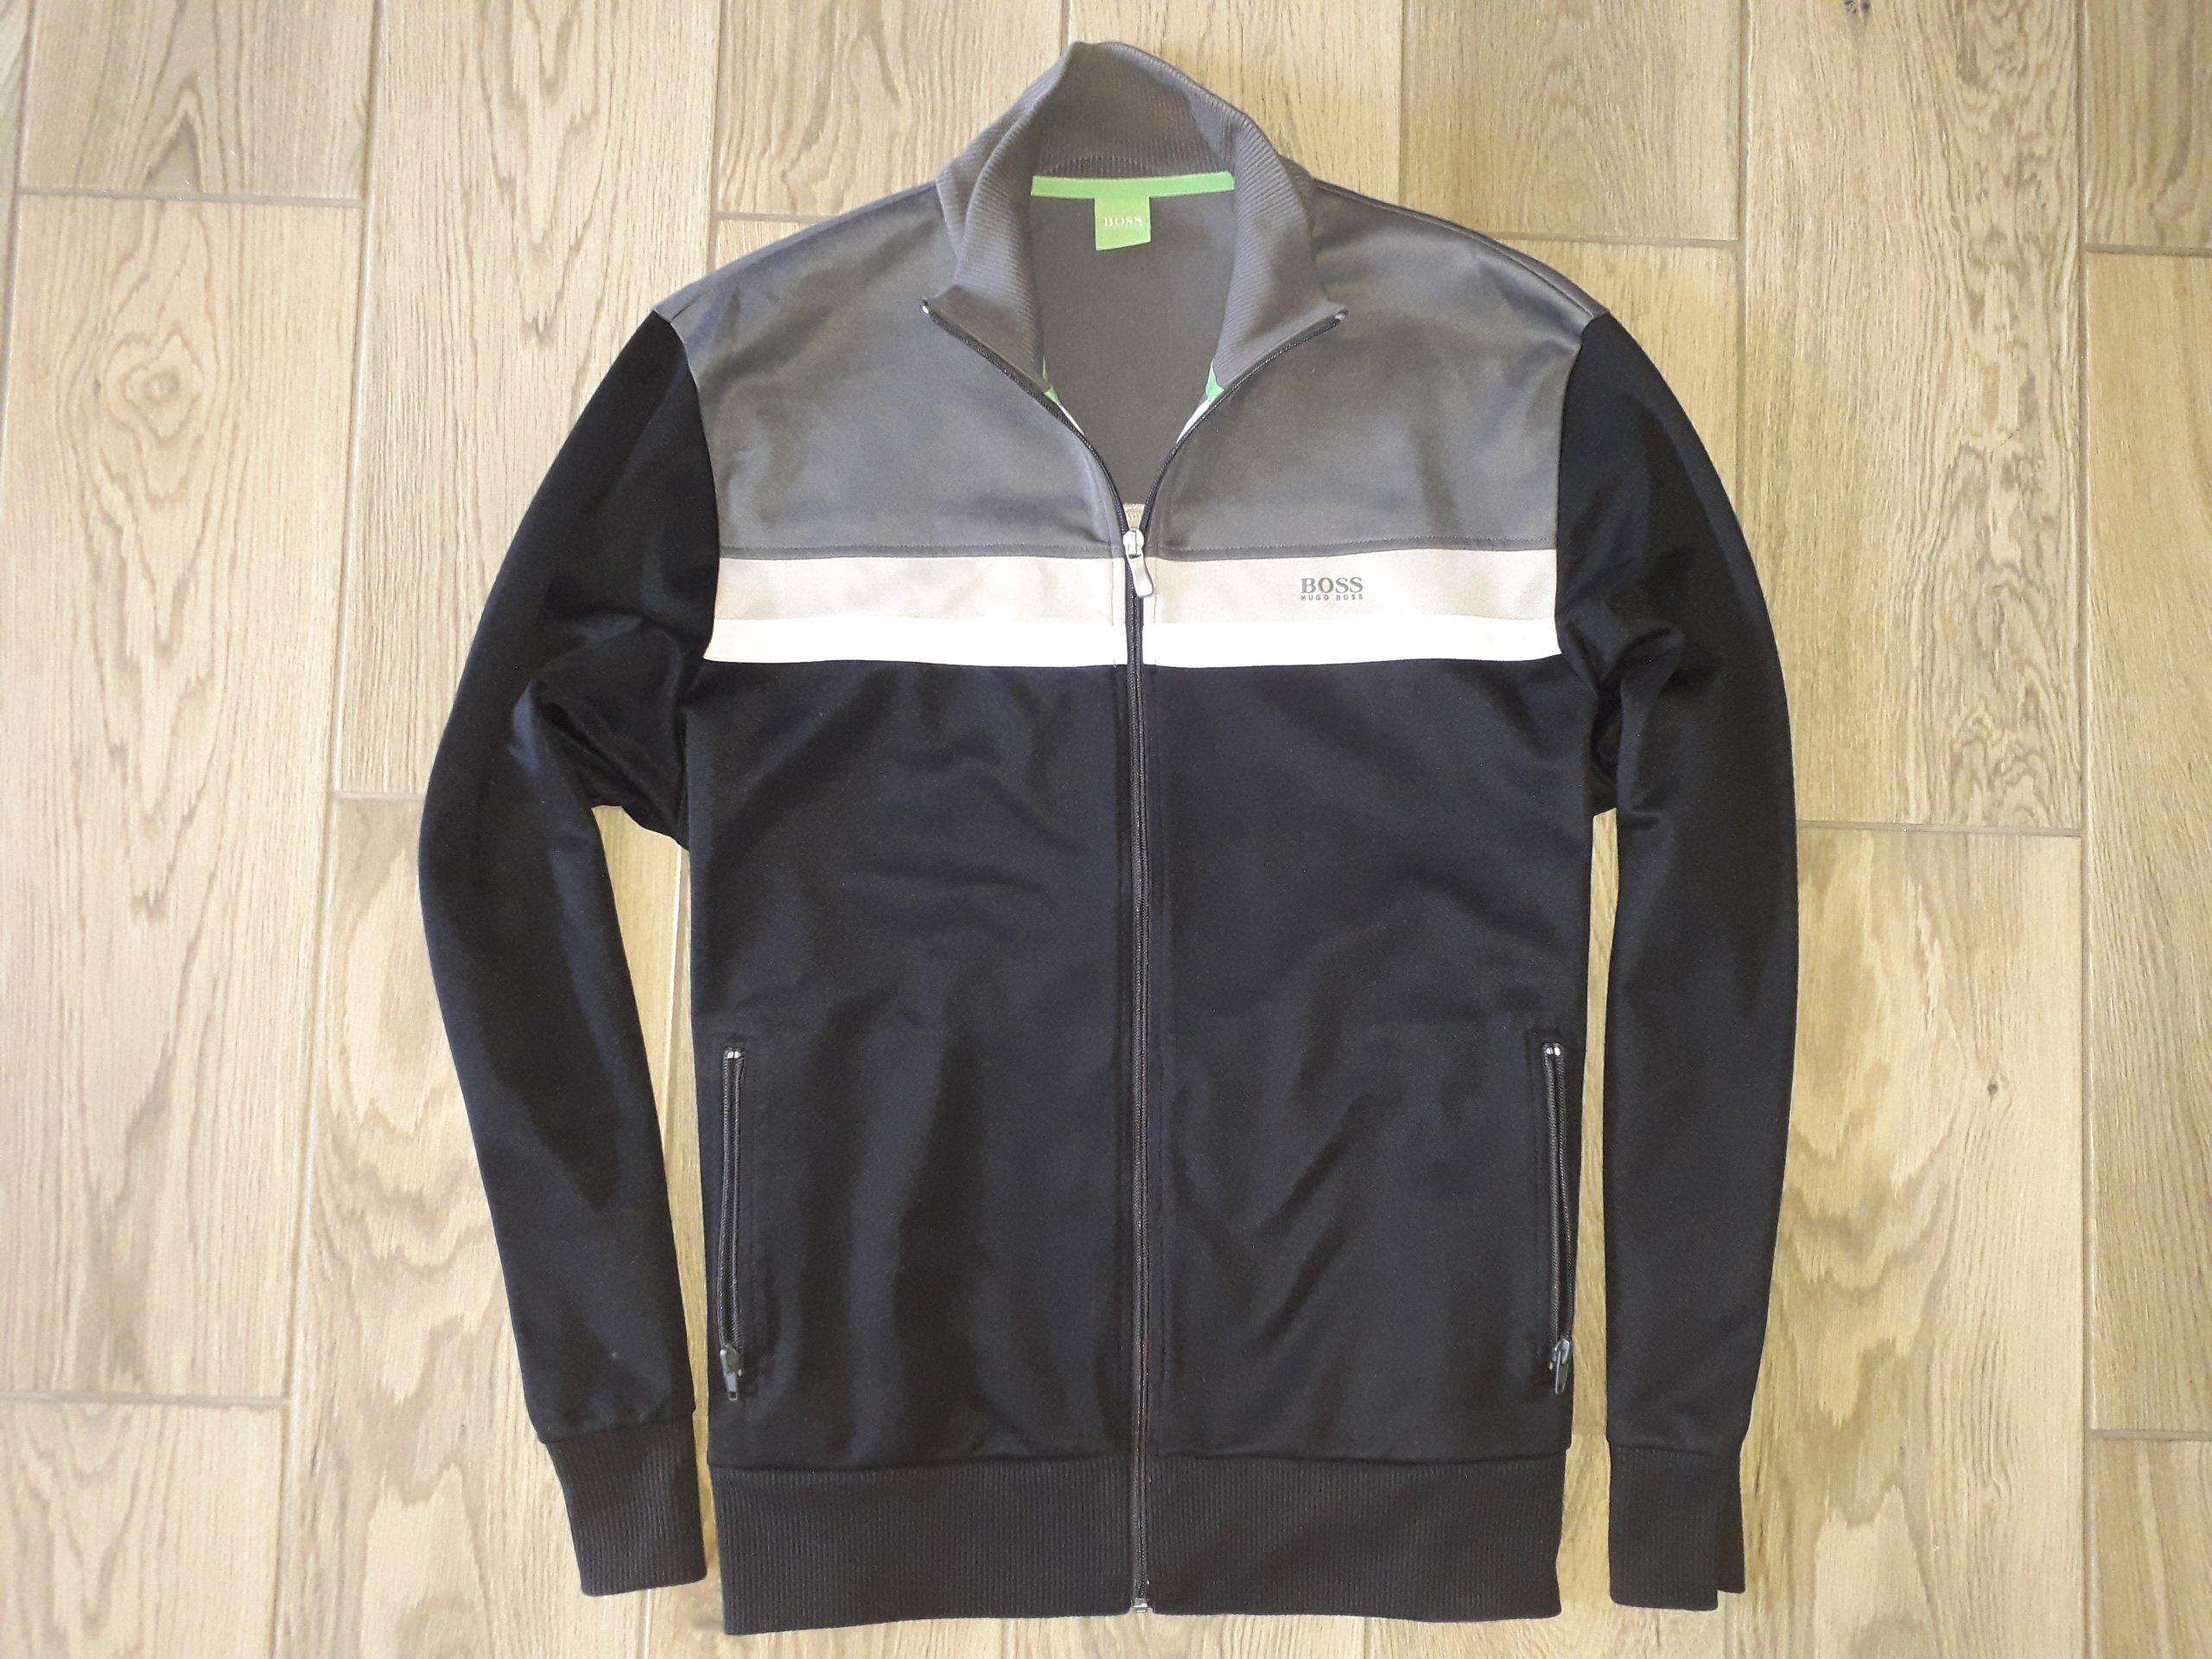 424f5a774785a HUGO BOSS GREEN bluza dresowa JAK NOWA roz. XXL - 7366795674 ...